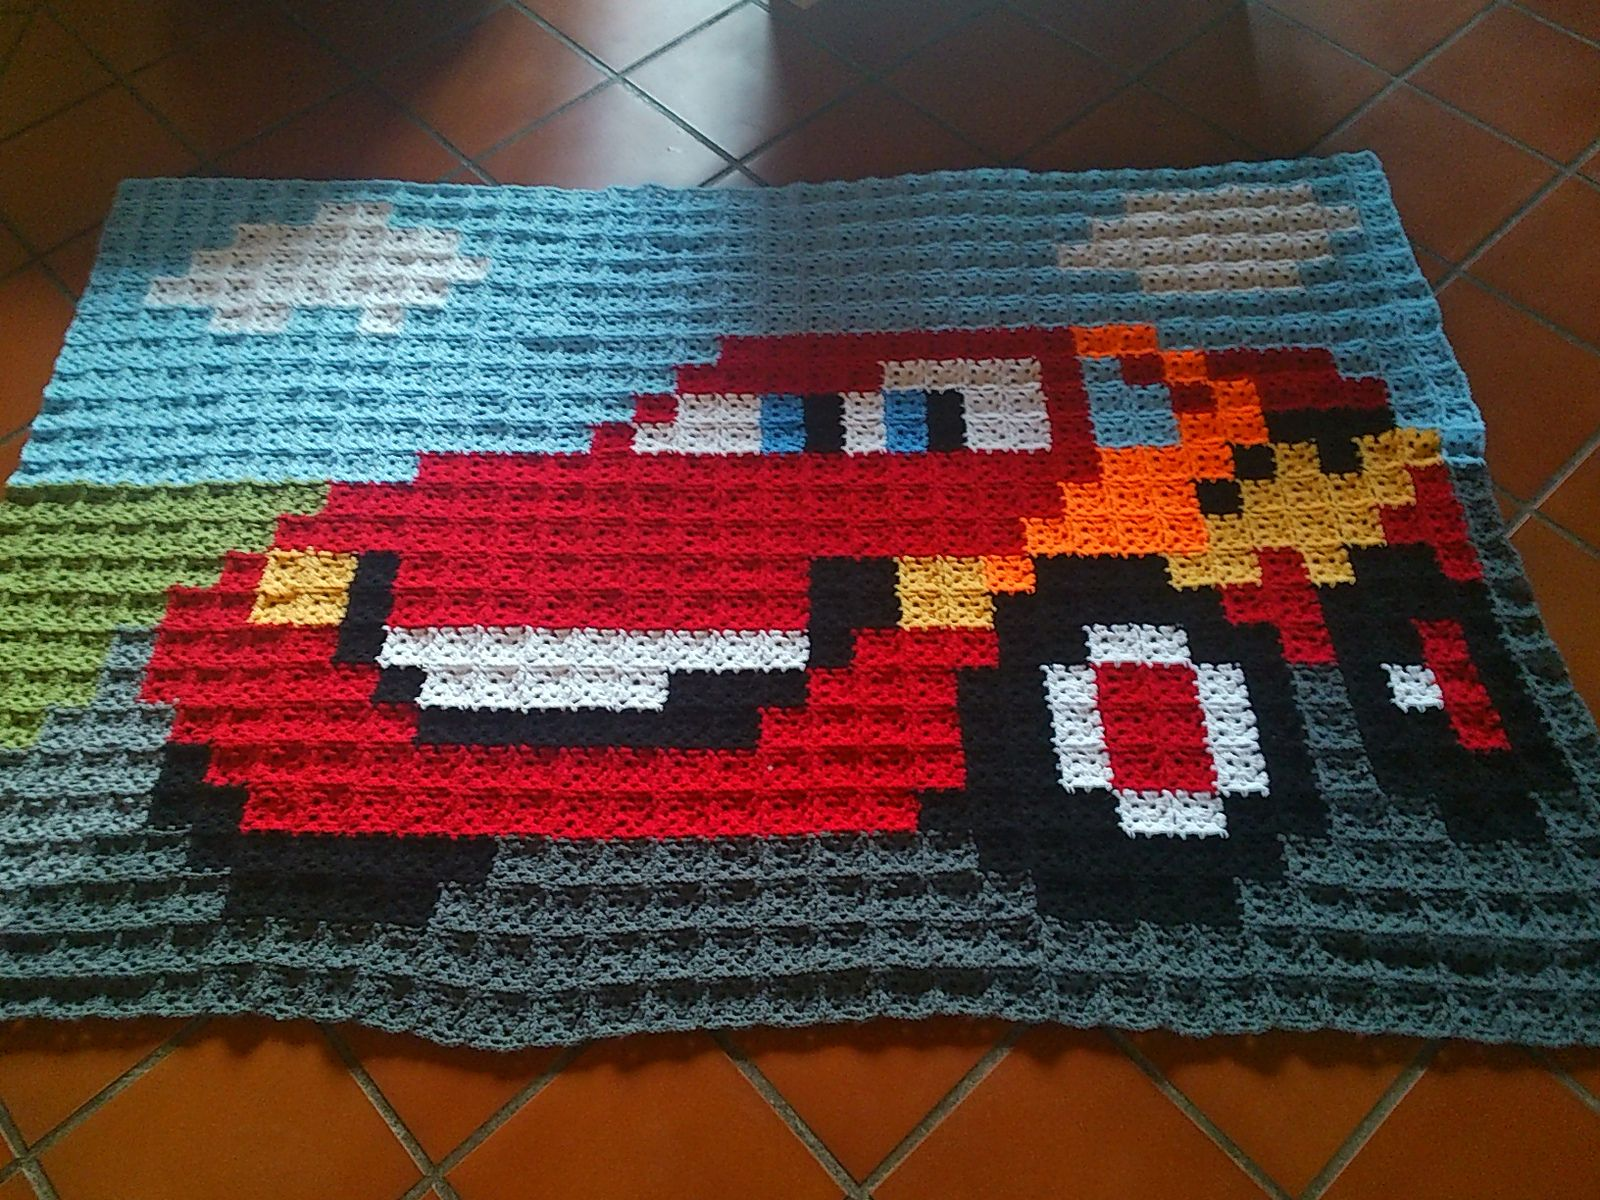 Ravelry Herlinde70 S 21 Blanket Cars Mcqueen Crochet Car Pixel Crochet Blanket Crochet Car Seat Cover